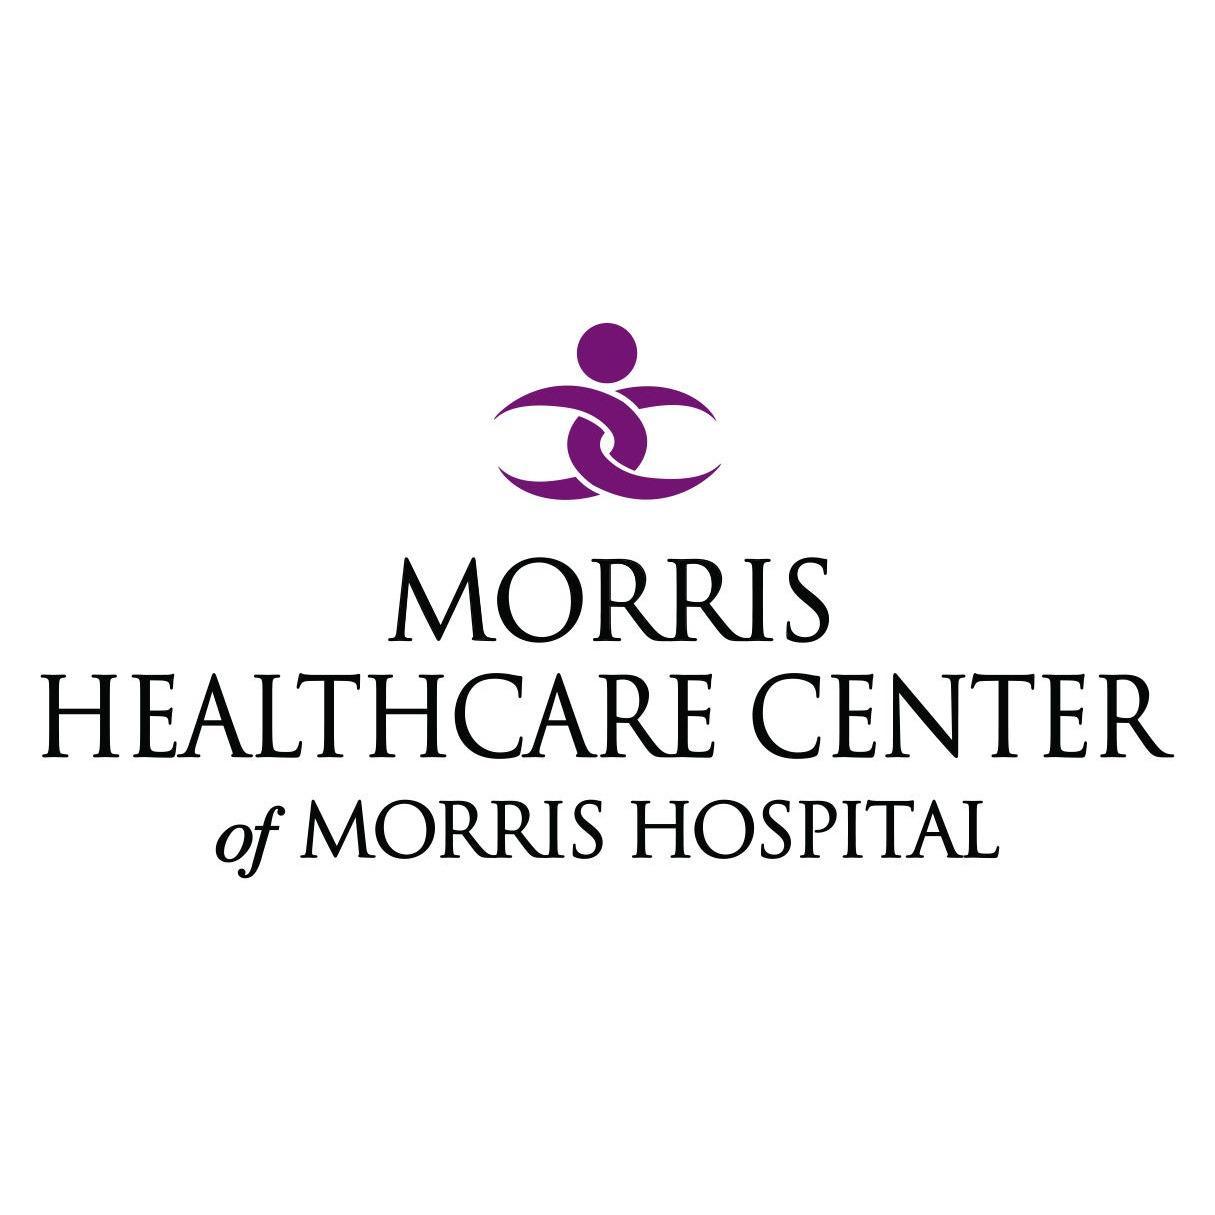 Morris Healthcare Center of Morris Hospital - Lakewood Drive - Morris, IL 60450 - (815)416-1300 | ShowMeLocal.com